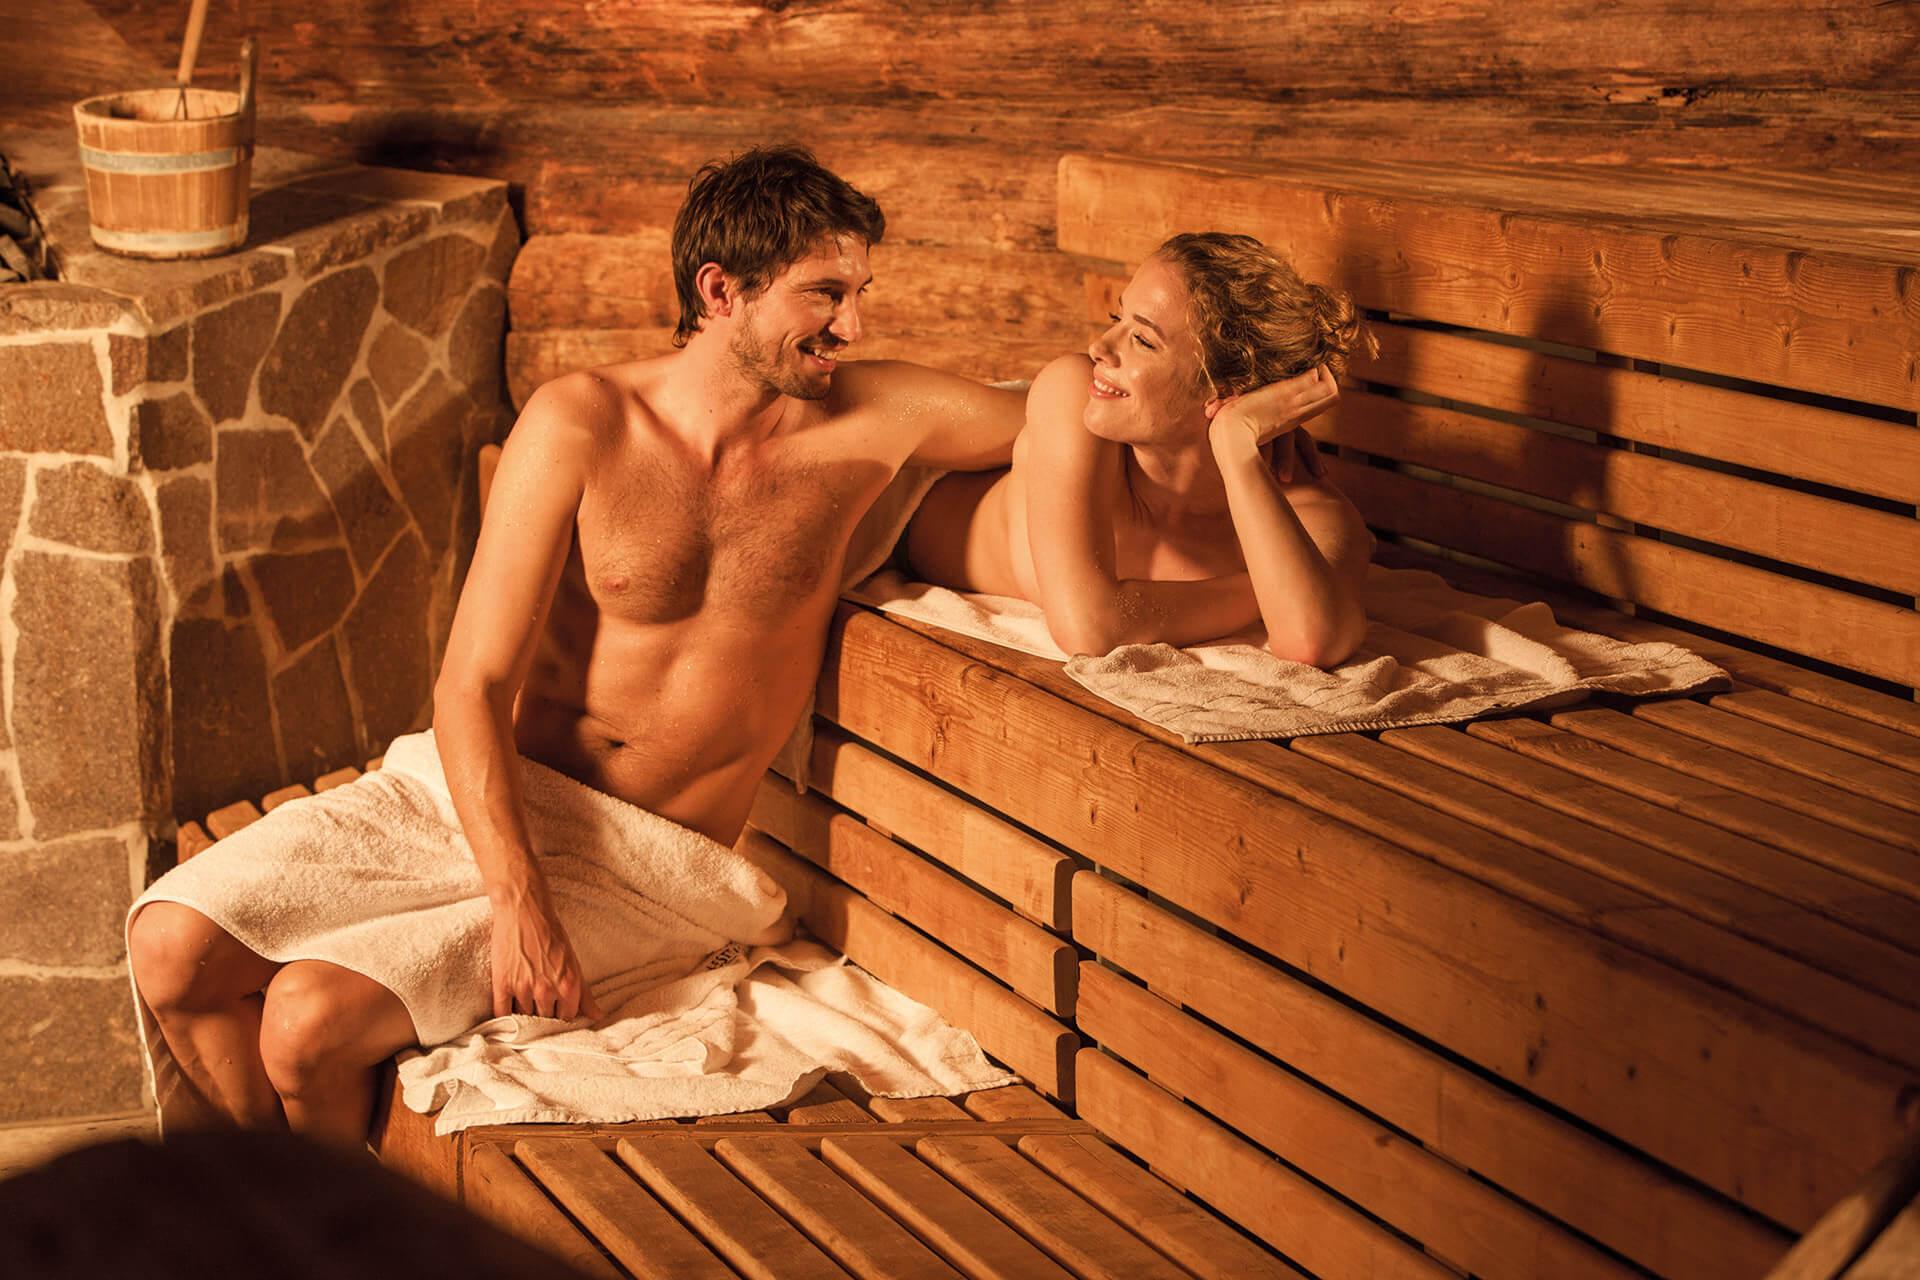 sauna club nrw frauenpornos